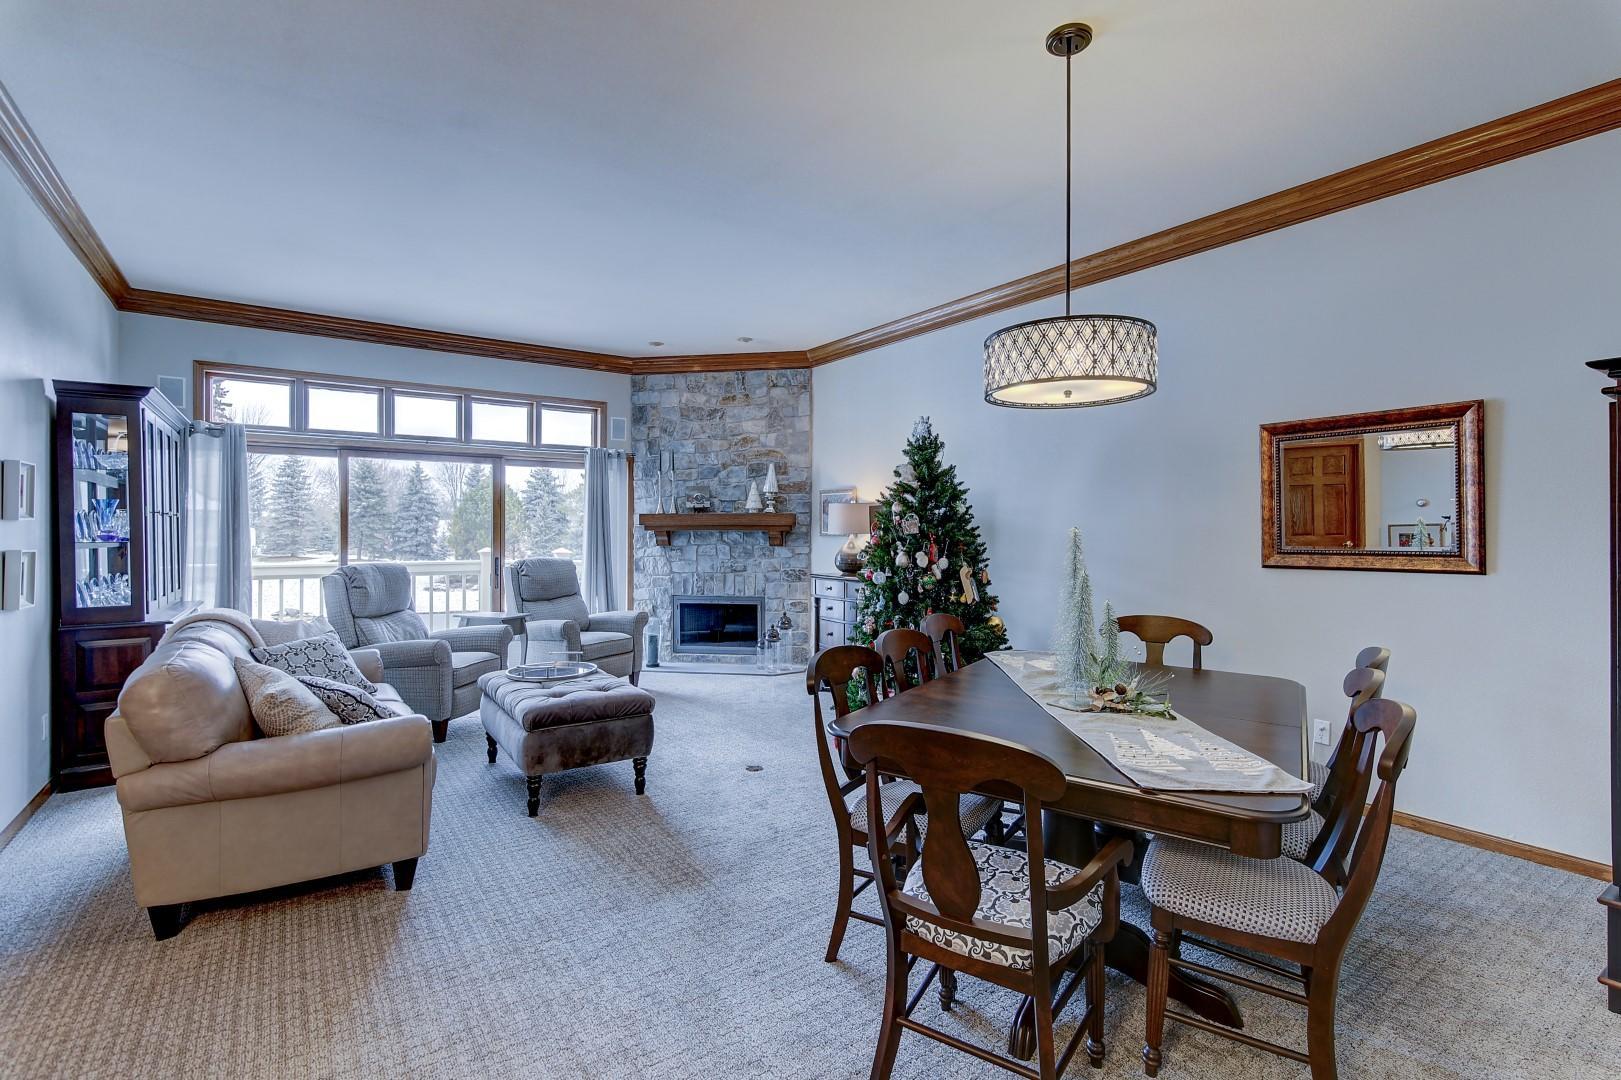 N14W30186 High Ridge Rd, Delafield, Wisconsin 53072, 4 Bedrooms Bedrooms, 10 Rooms Rooms,2 BathroomsBathrooms,Condominiums,For Sale,High Ridge Rd,1,1616118